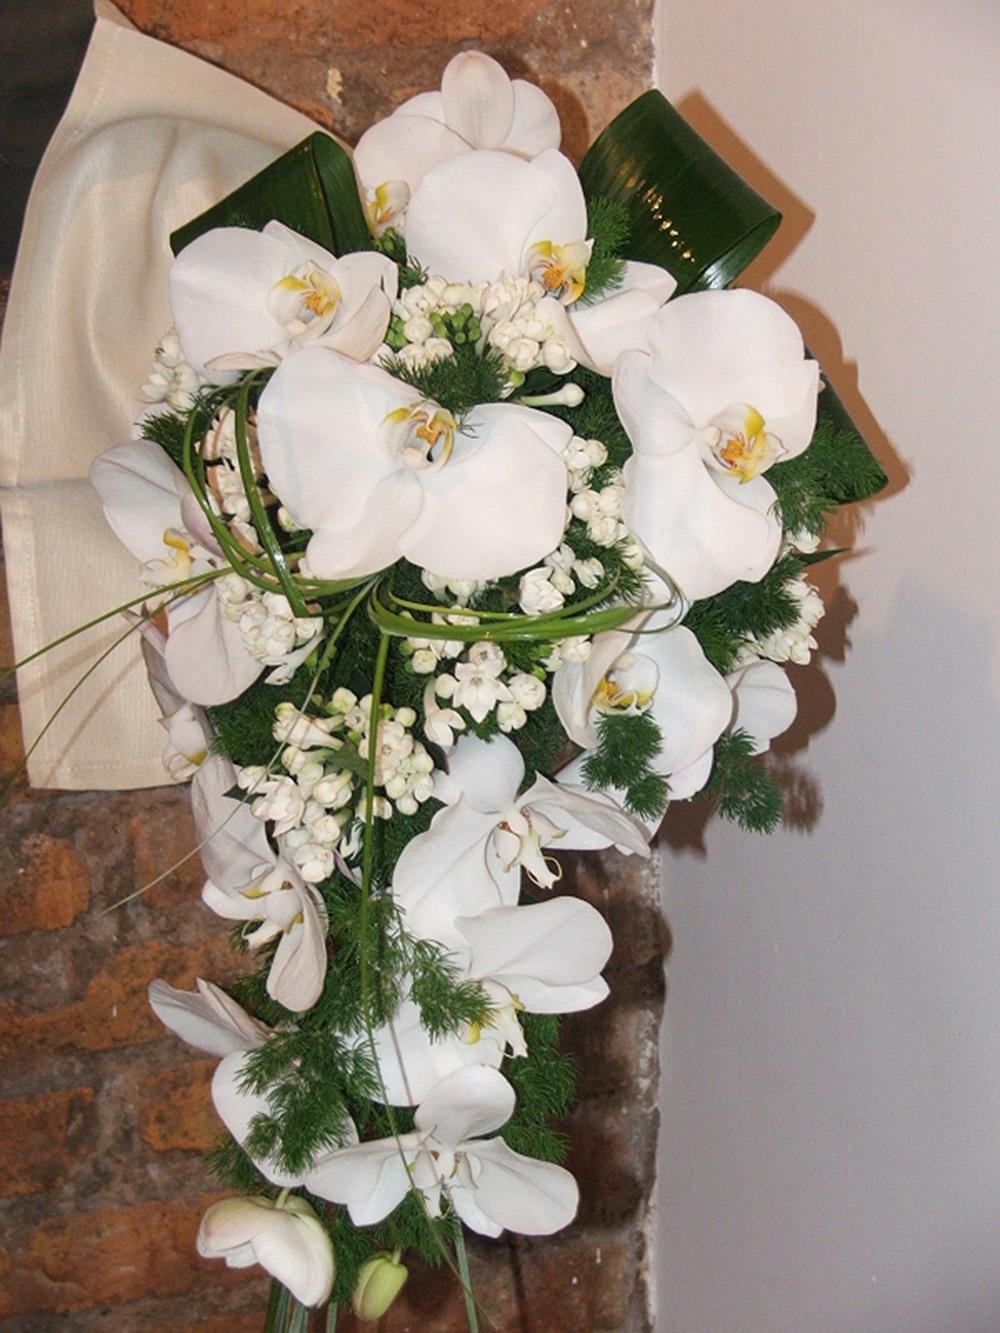 Bouquet Sposa Roma.Bouquet Sposa Roma